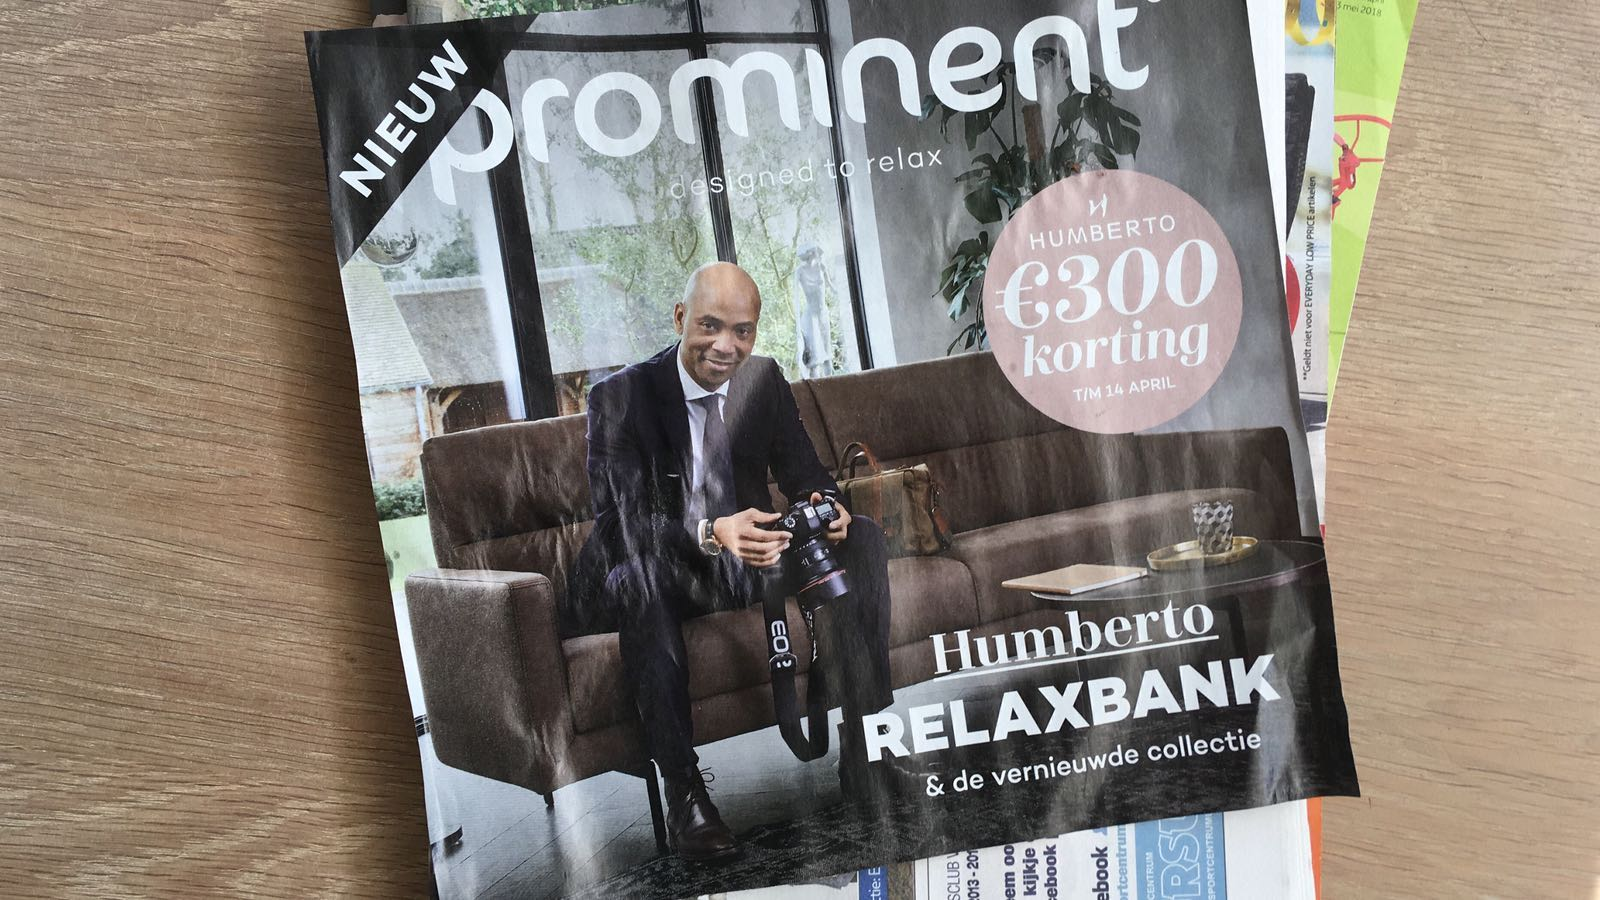 Umberto uitgespeeld?